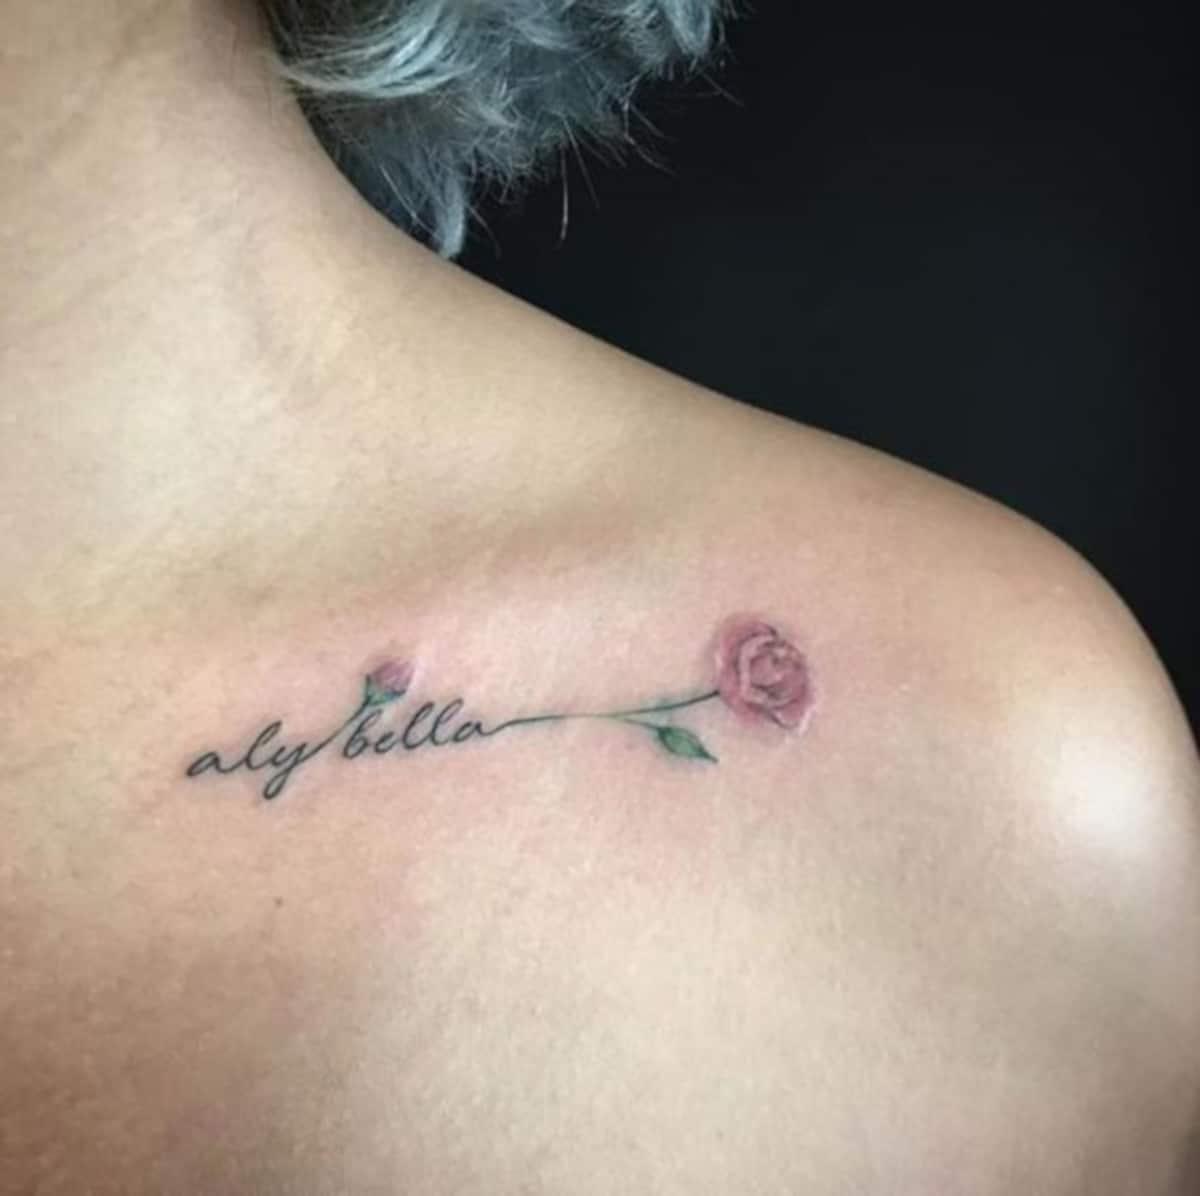 Tatuaje Rosa Bella y Bestia Hombro